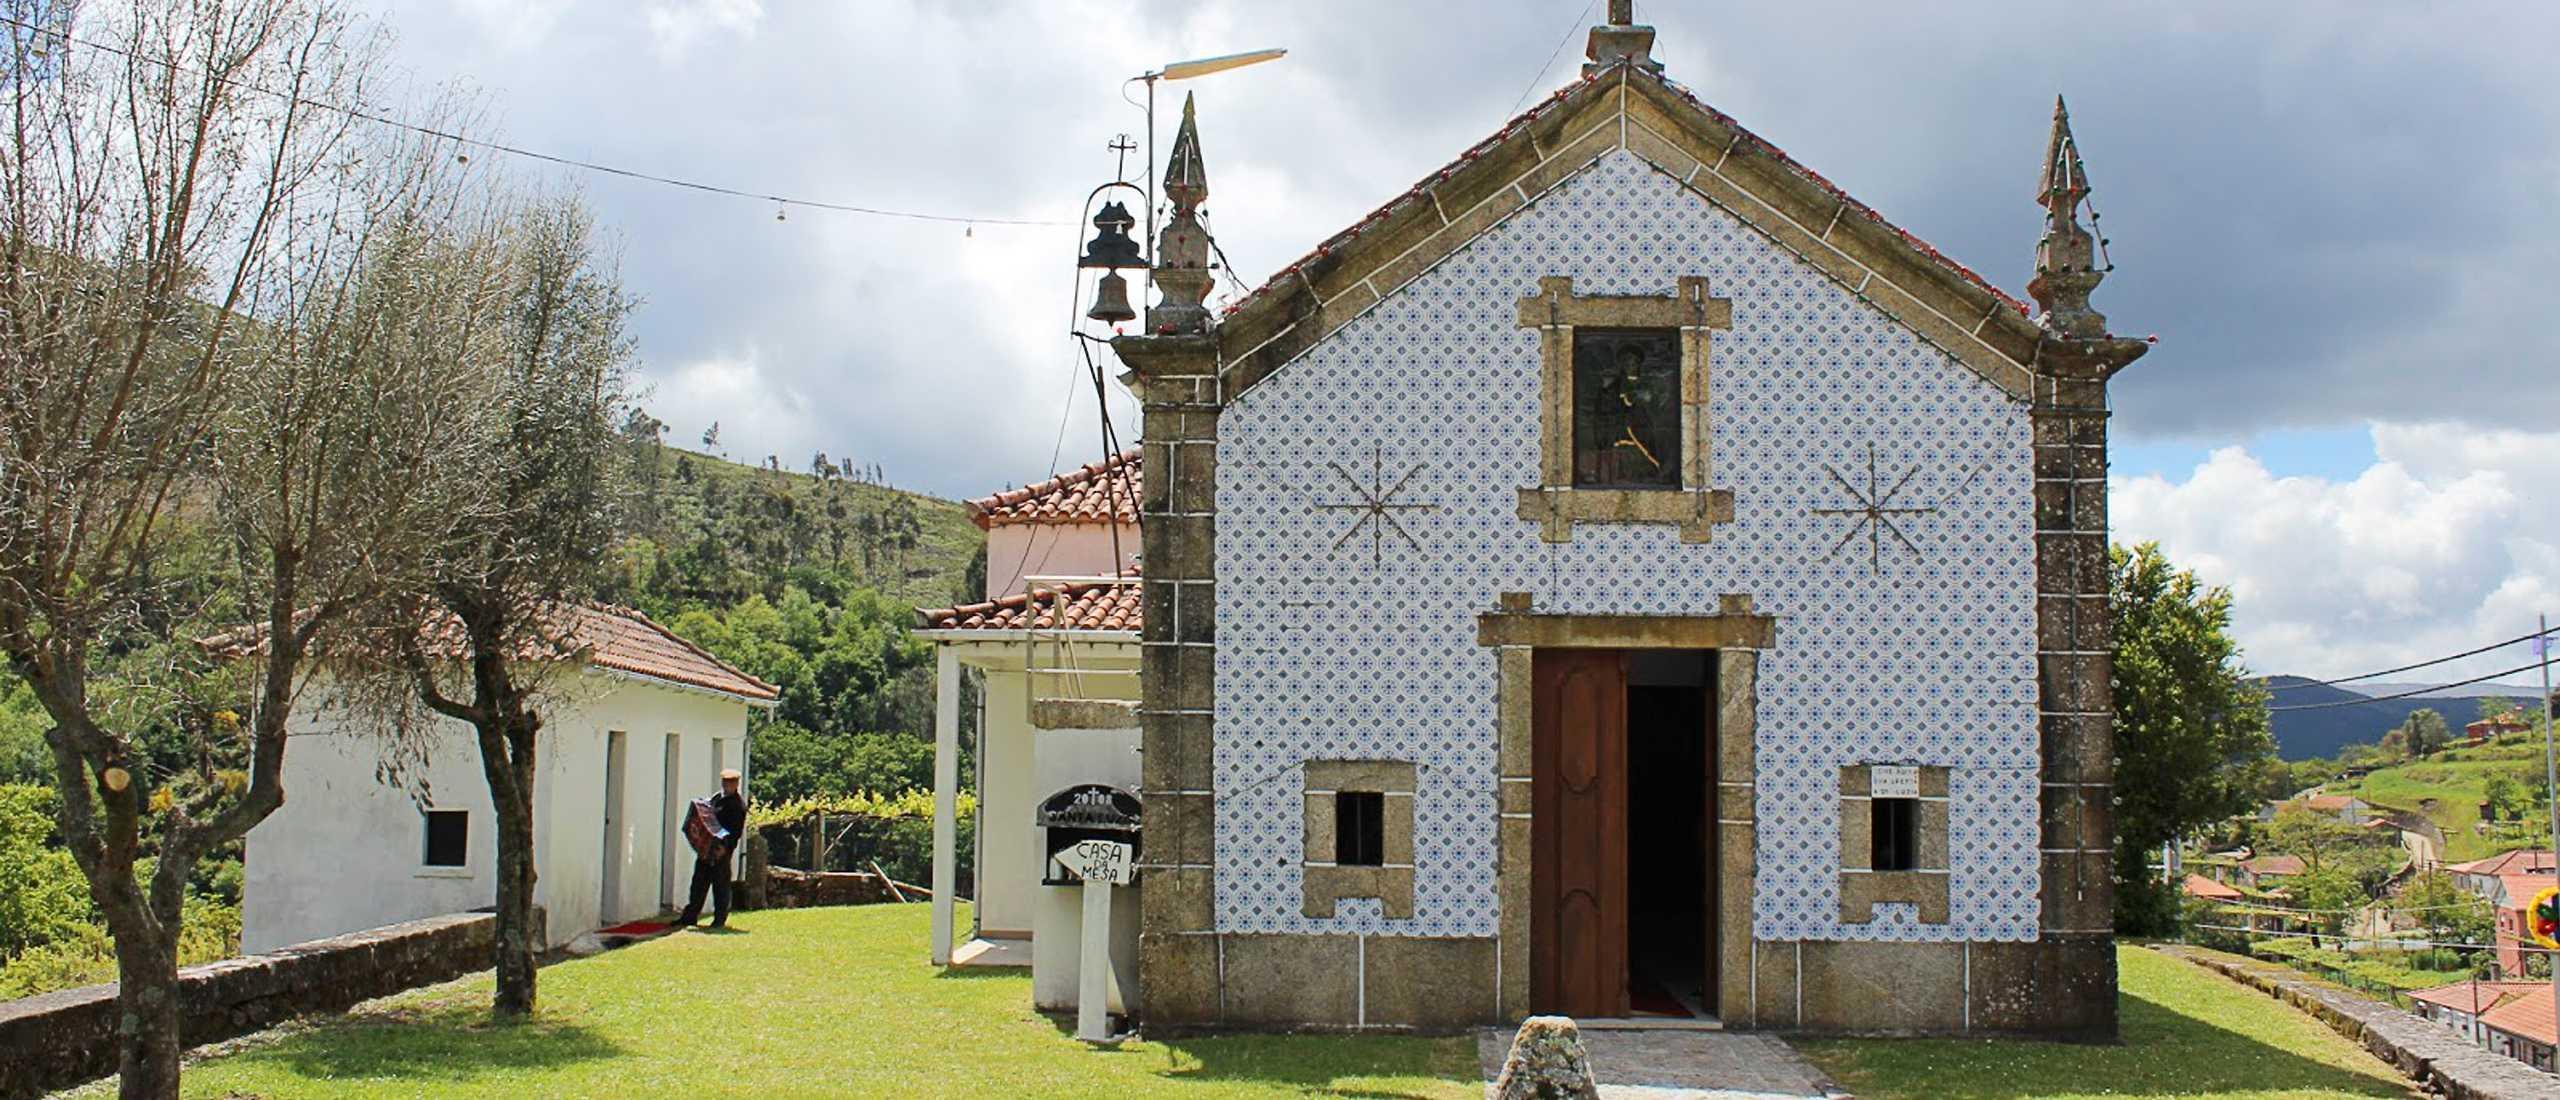 Freguesia Labrujó Rendufe e Vilar do Monte